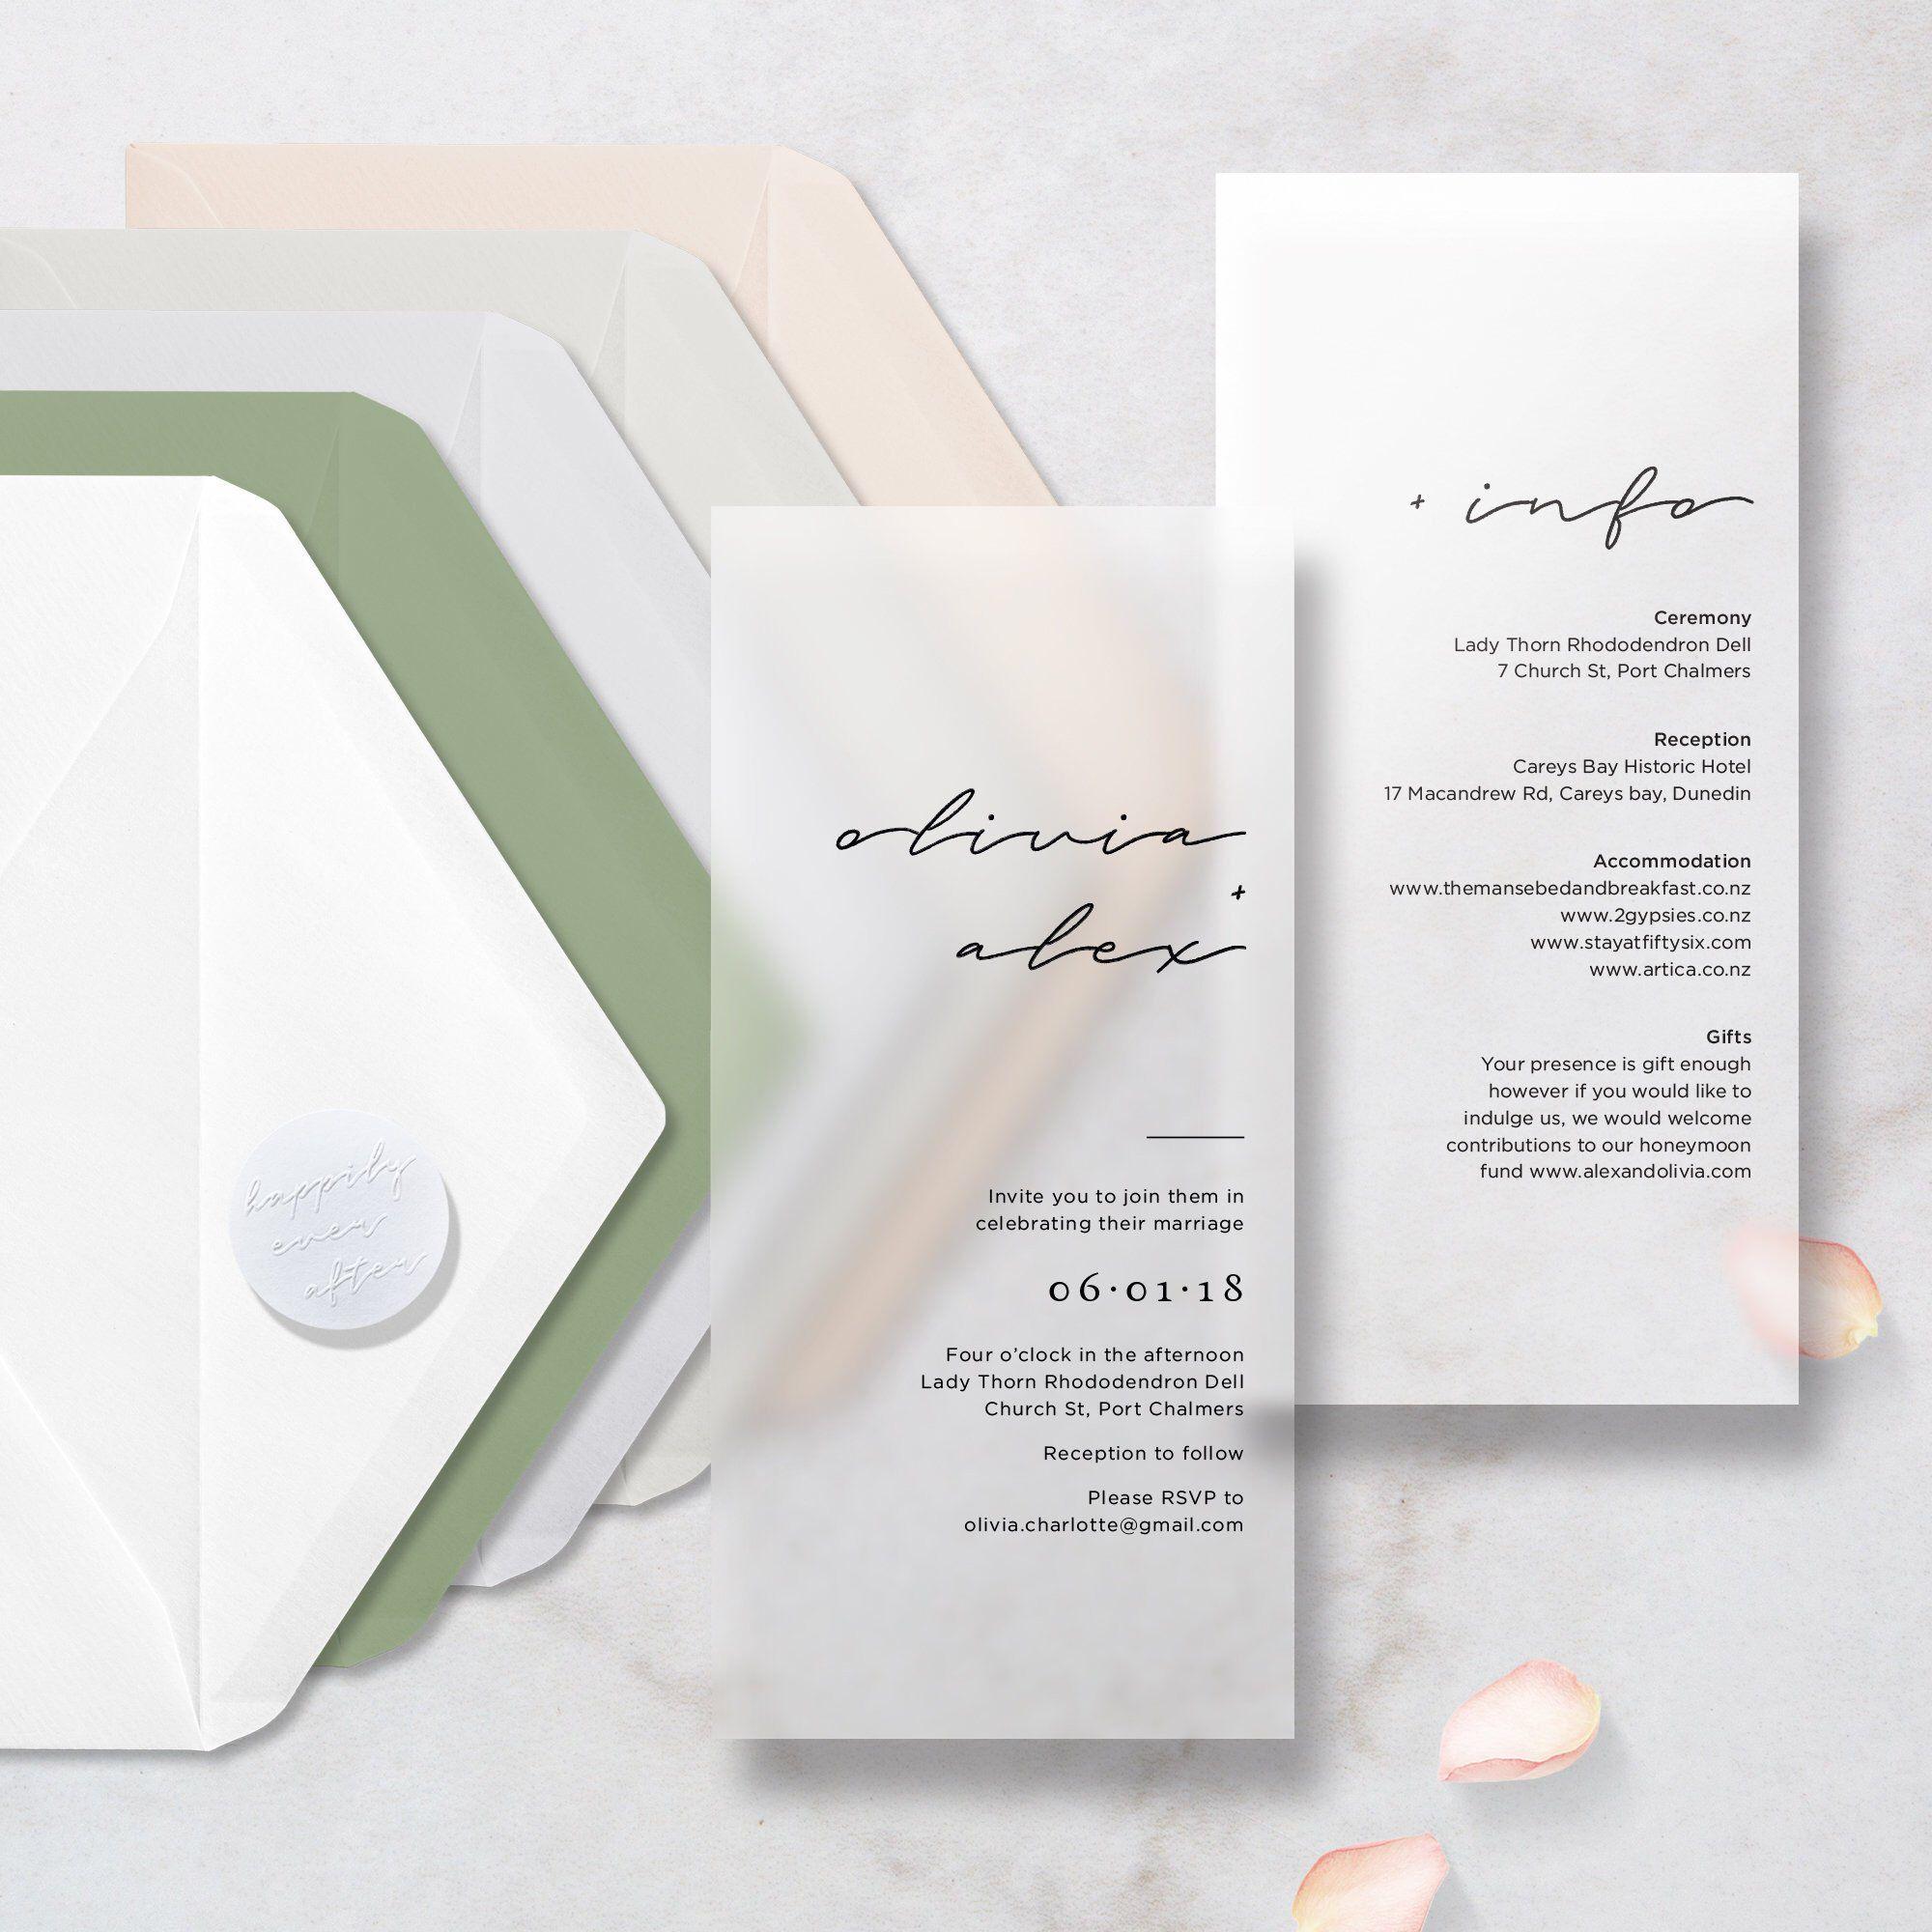 Translucent 2 vellums script wedding invitation includes info card choice of envelope sticker wedding invitation vellum clear minimal minimalism